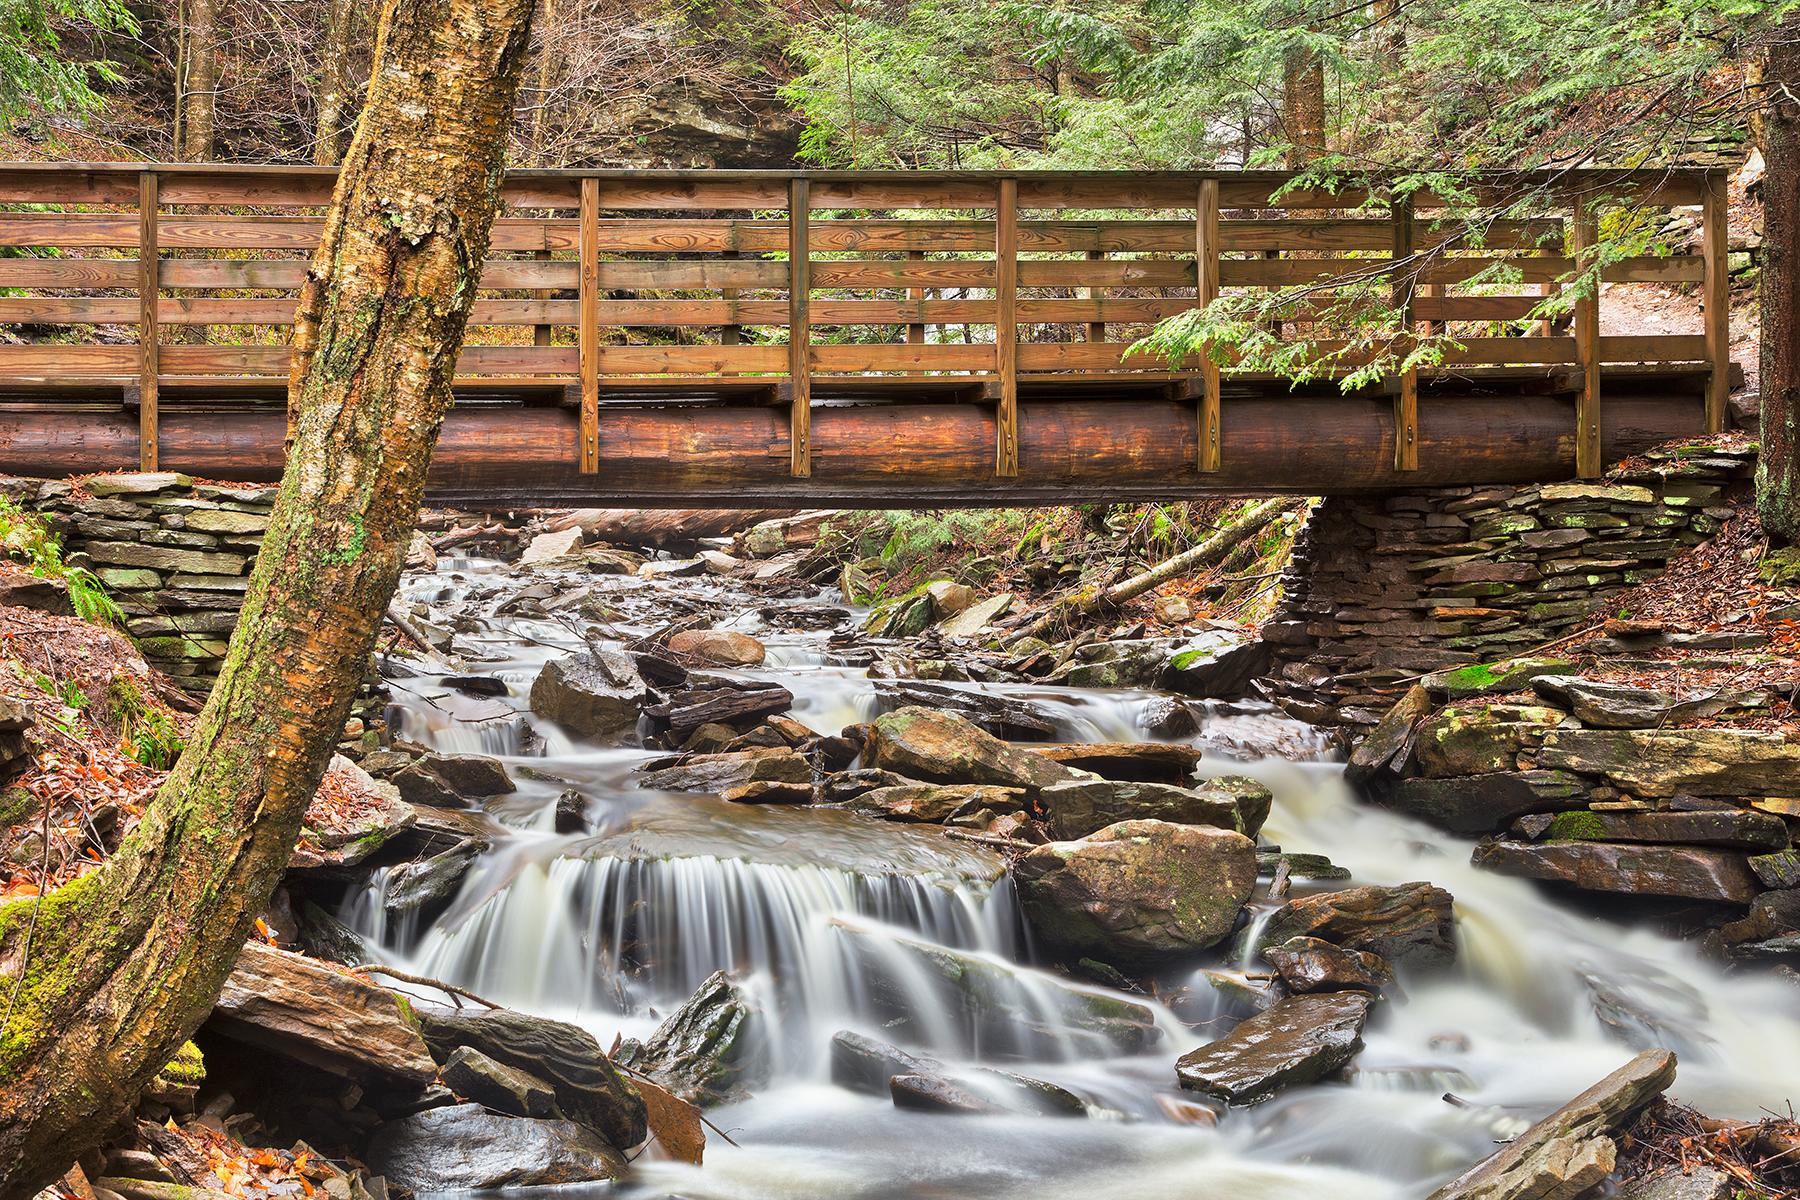 Rustic kitchen creek bridge - hdr photo